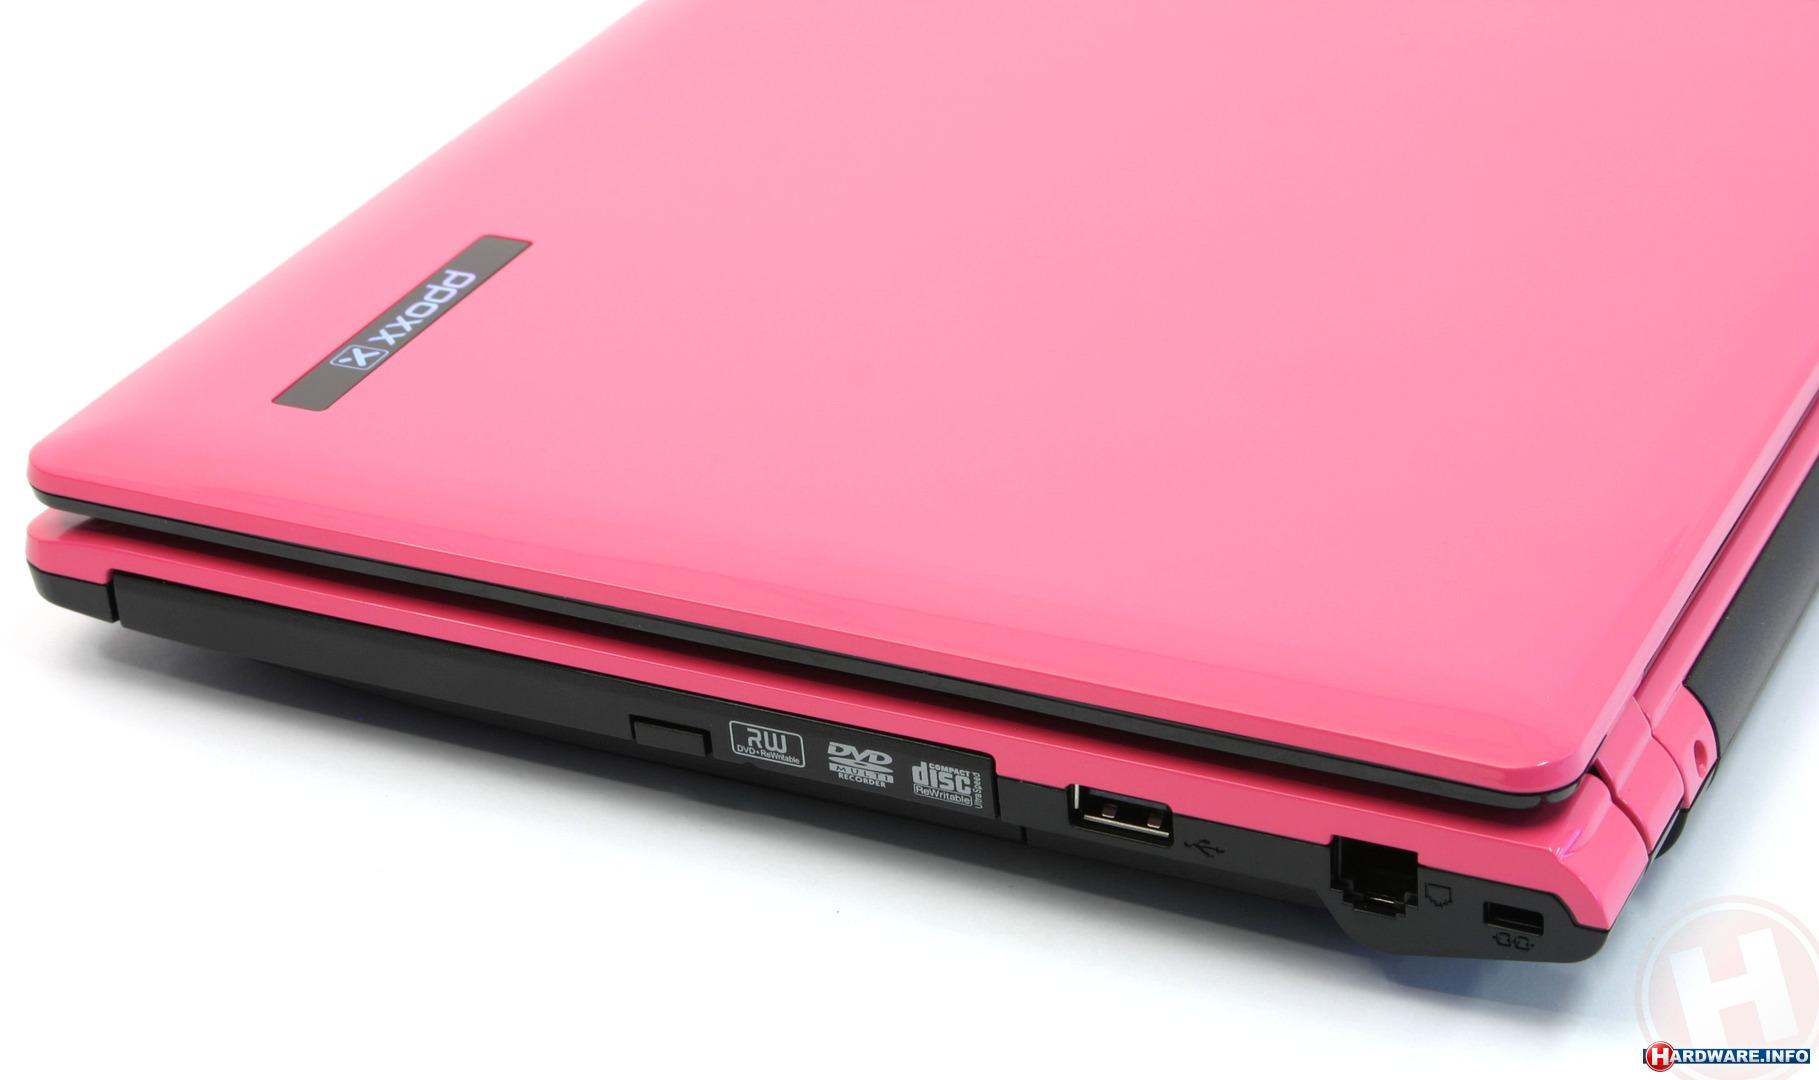 Nieuw Knalroze notebook getest - Hardware Info JU-93